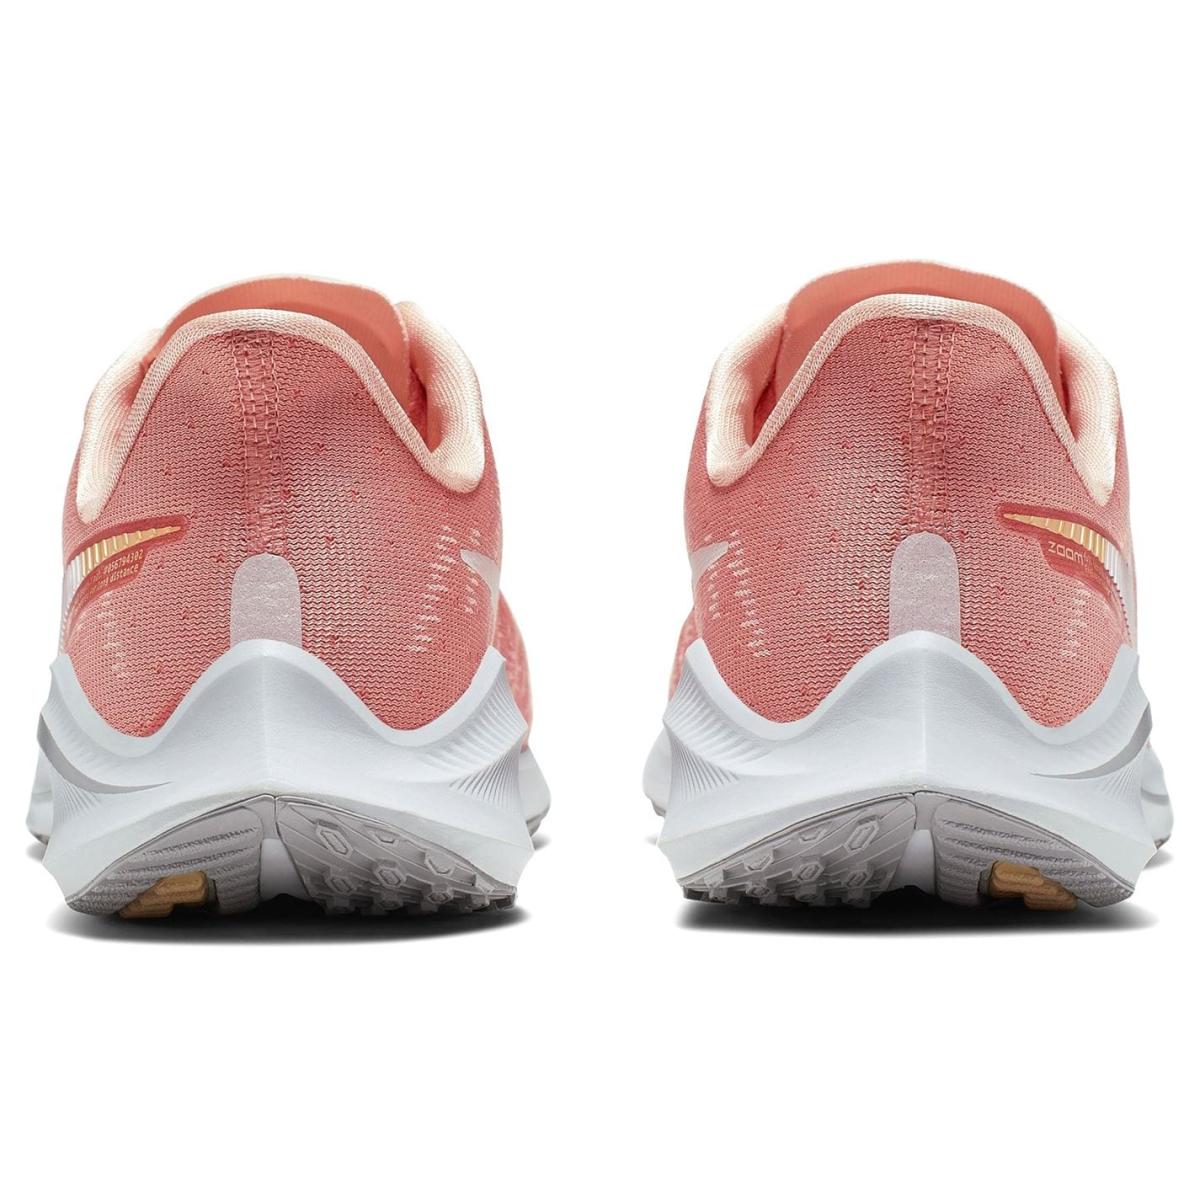 Nike-Zoom-Vomero-14-Turnschuhe-Damen-Sneaker-Sportschuhe-Laufschuhe-4165 Indexbild 5